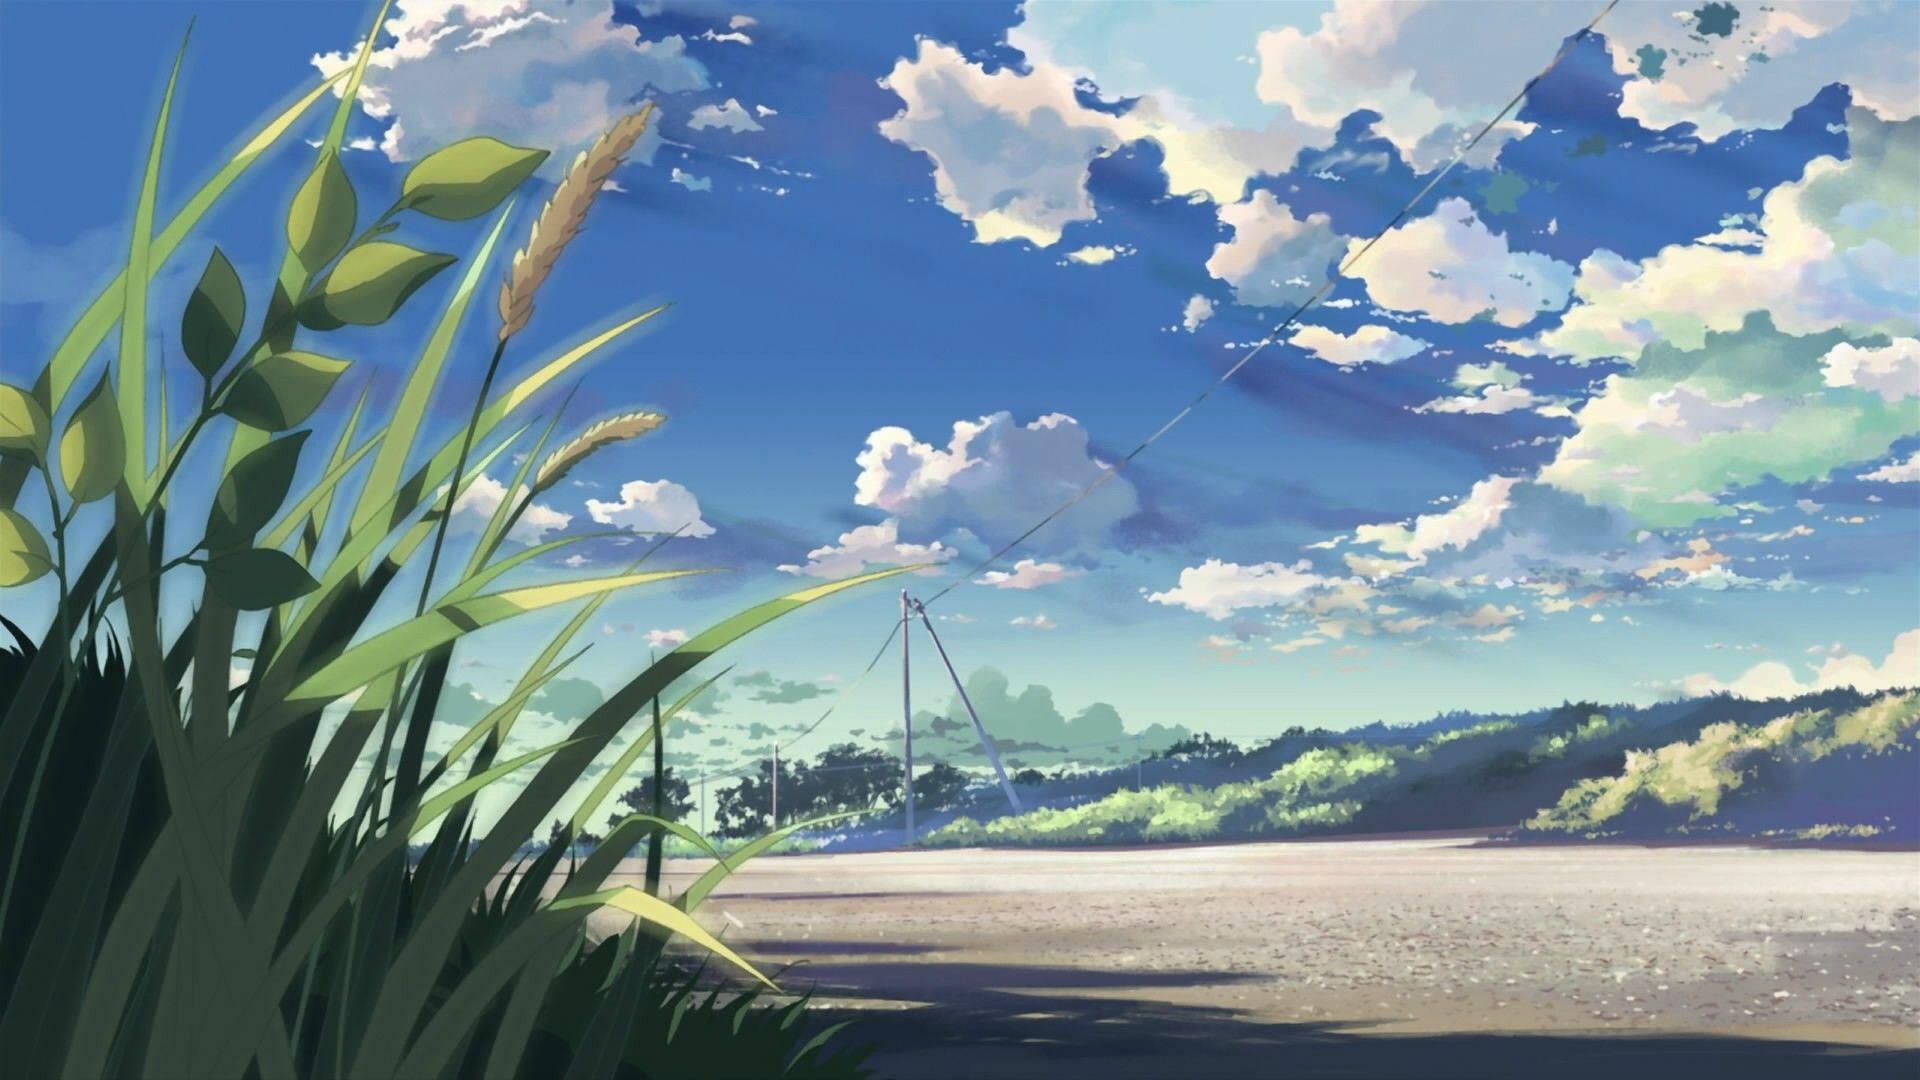 Anime Wallpapers Scenery Wallpaper Landscape Wallpaper Anime Scenery